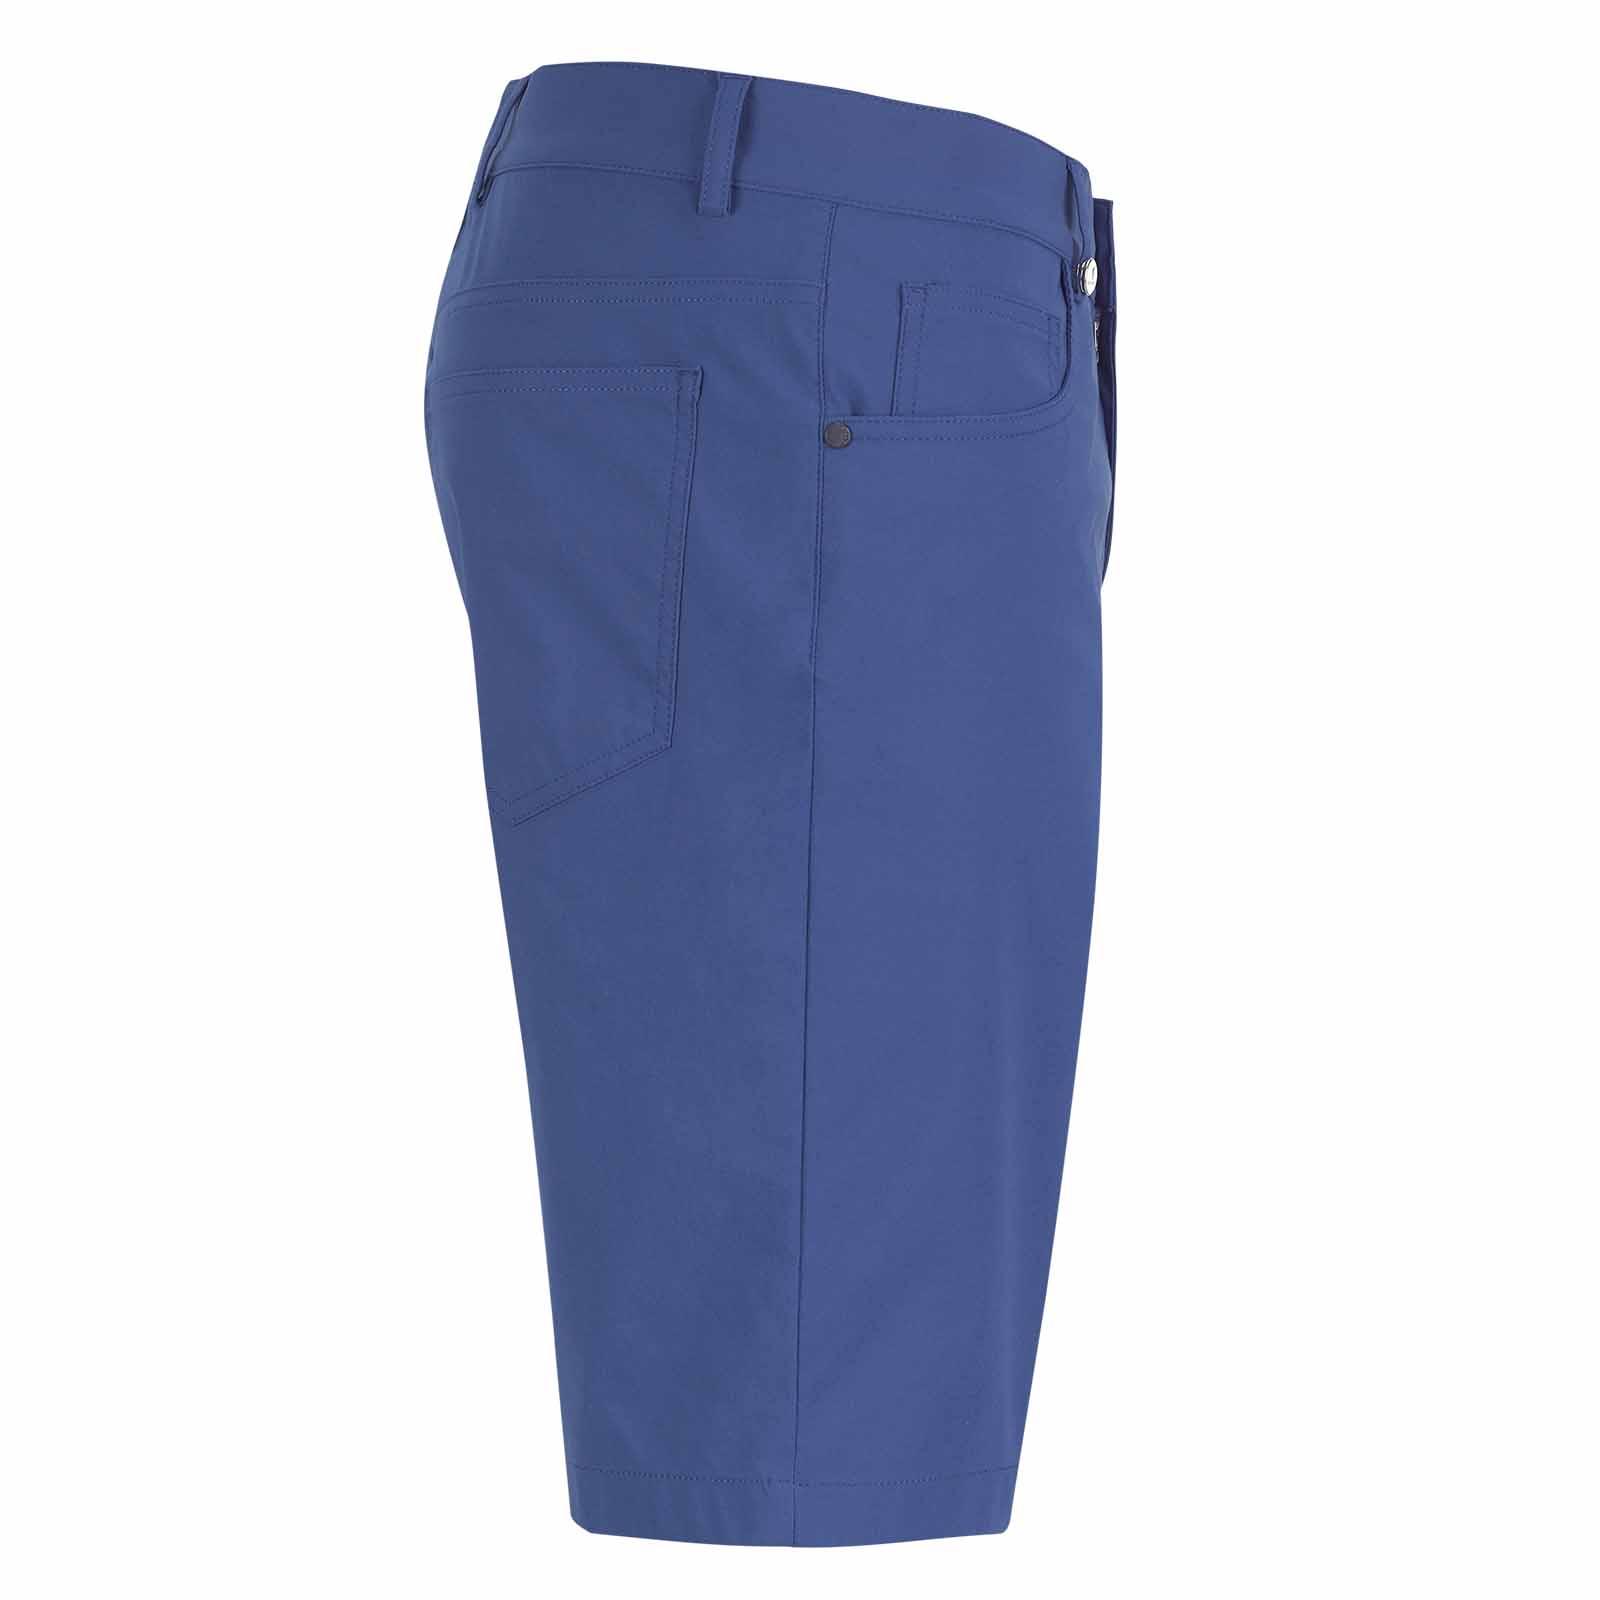 Herren 5-Pocket Bermuda mit Sofileta® UV-Protection und hohem Stretchanteil